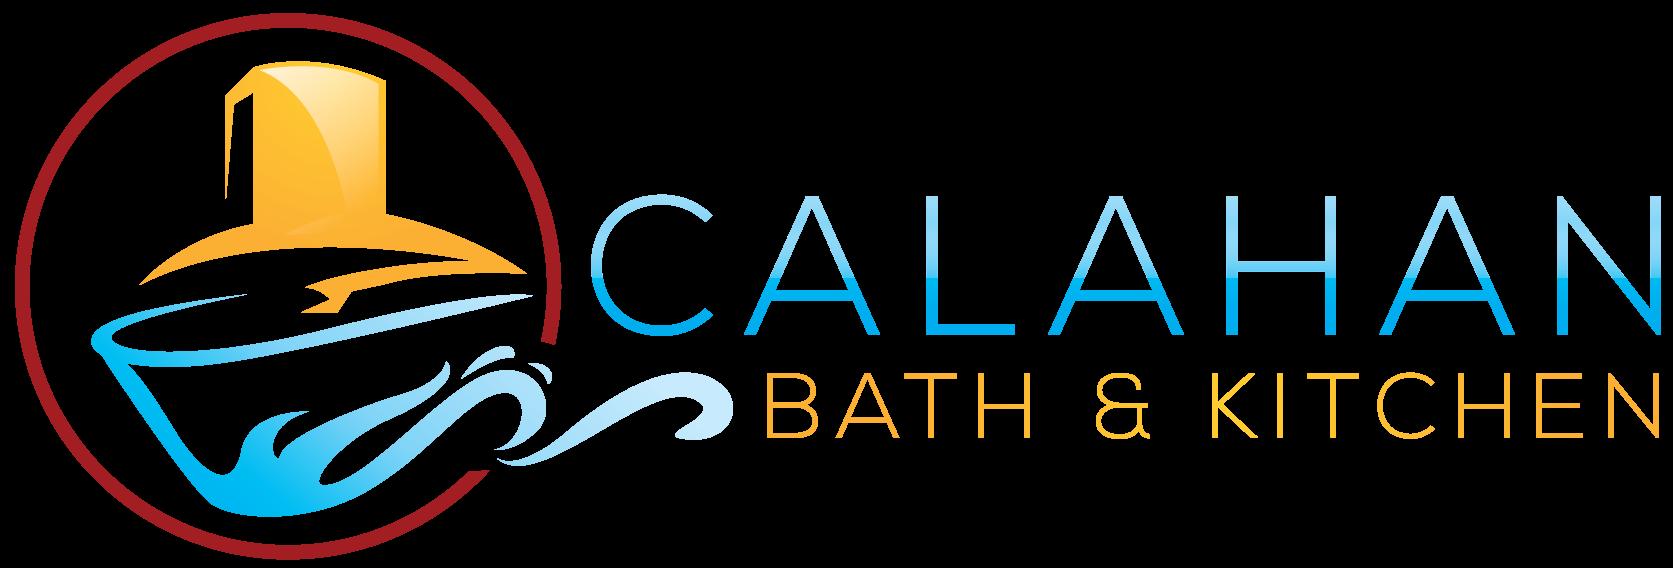 Calahan Bath and Kitchen